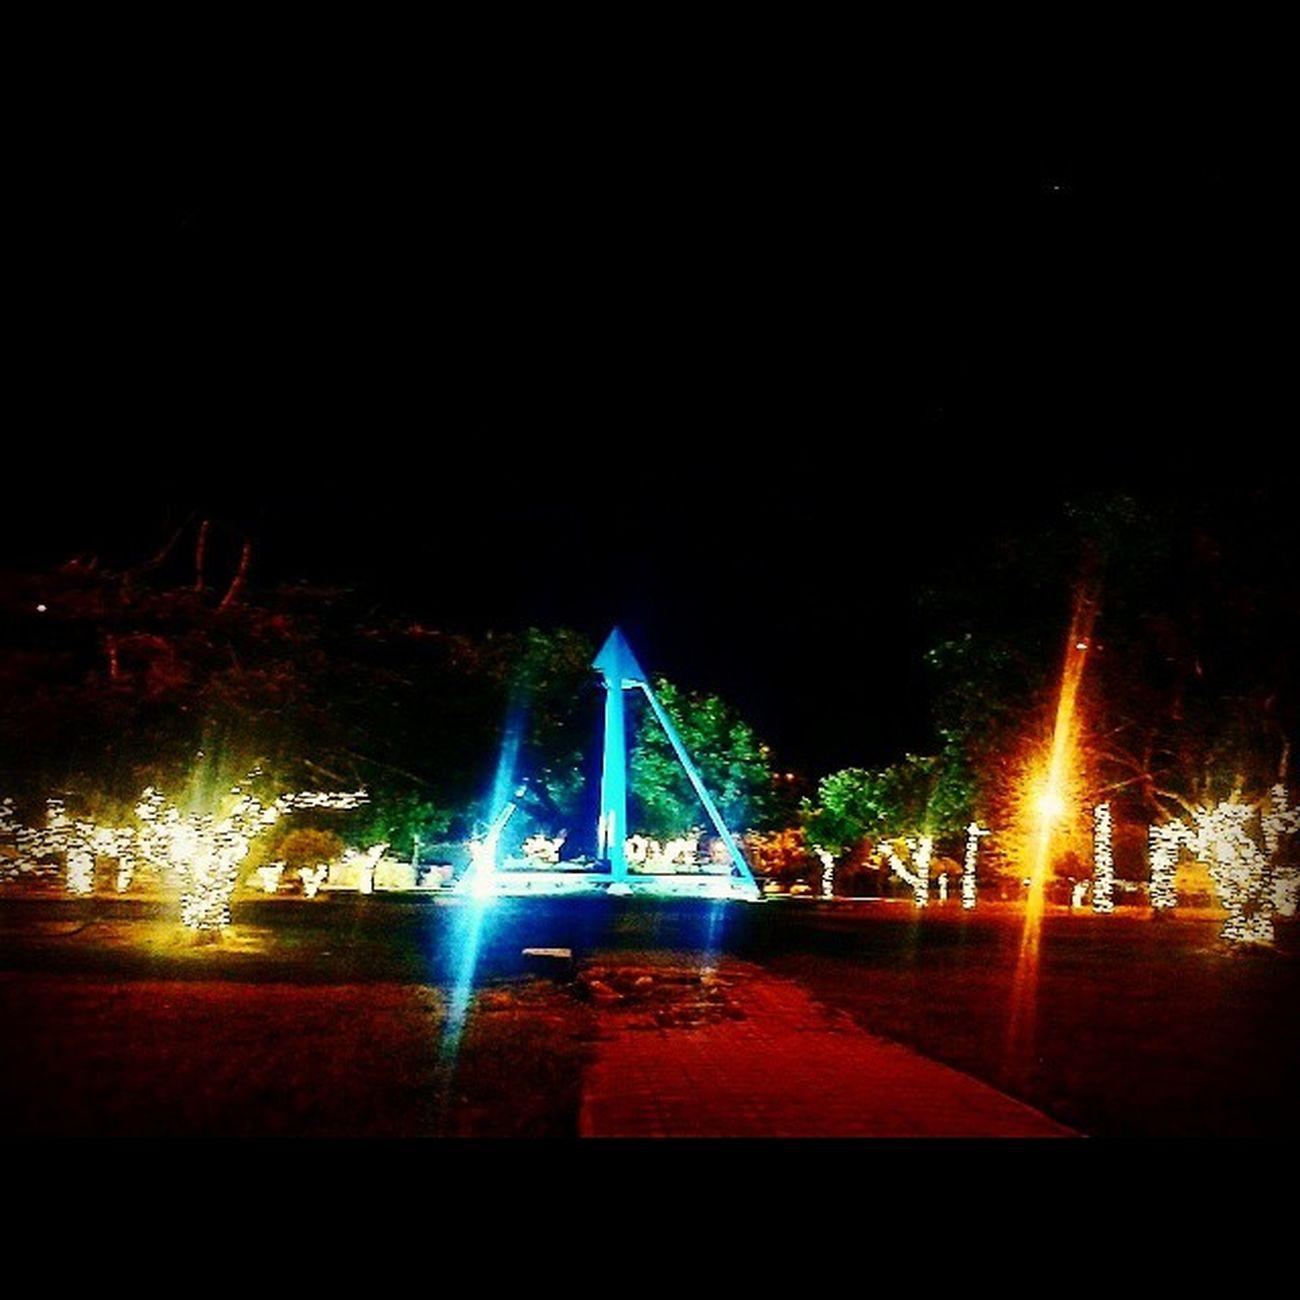 Chegando o Natal 🌲🎄🎍🎋🎁🎉🎇🎆 Natal Luzes Piramide Azul Verde Amarelo Laranja Vermelho Praça  PraçaDaPirâmide Boavista Roraima Norte Brasil Noite